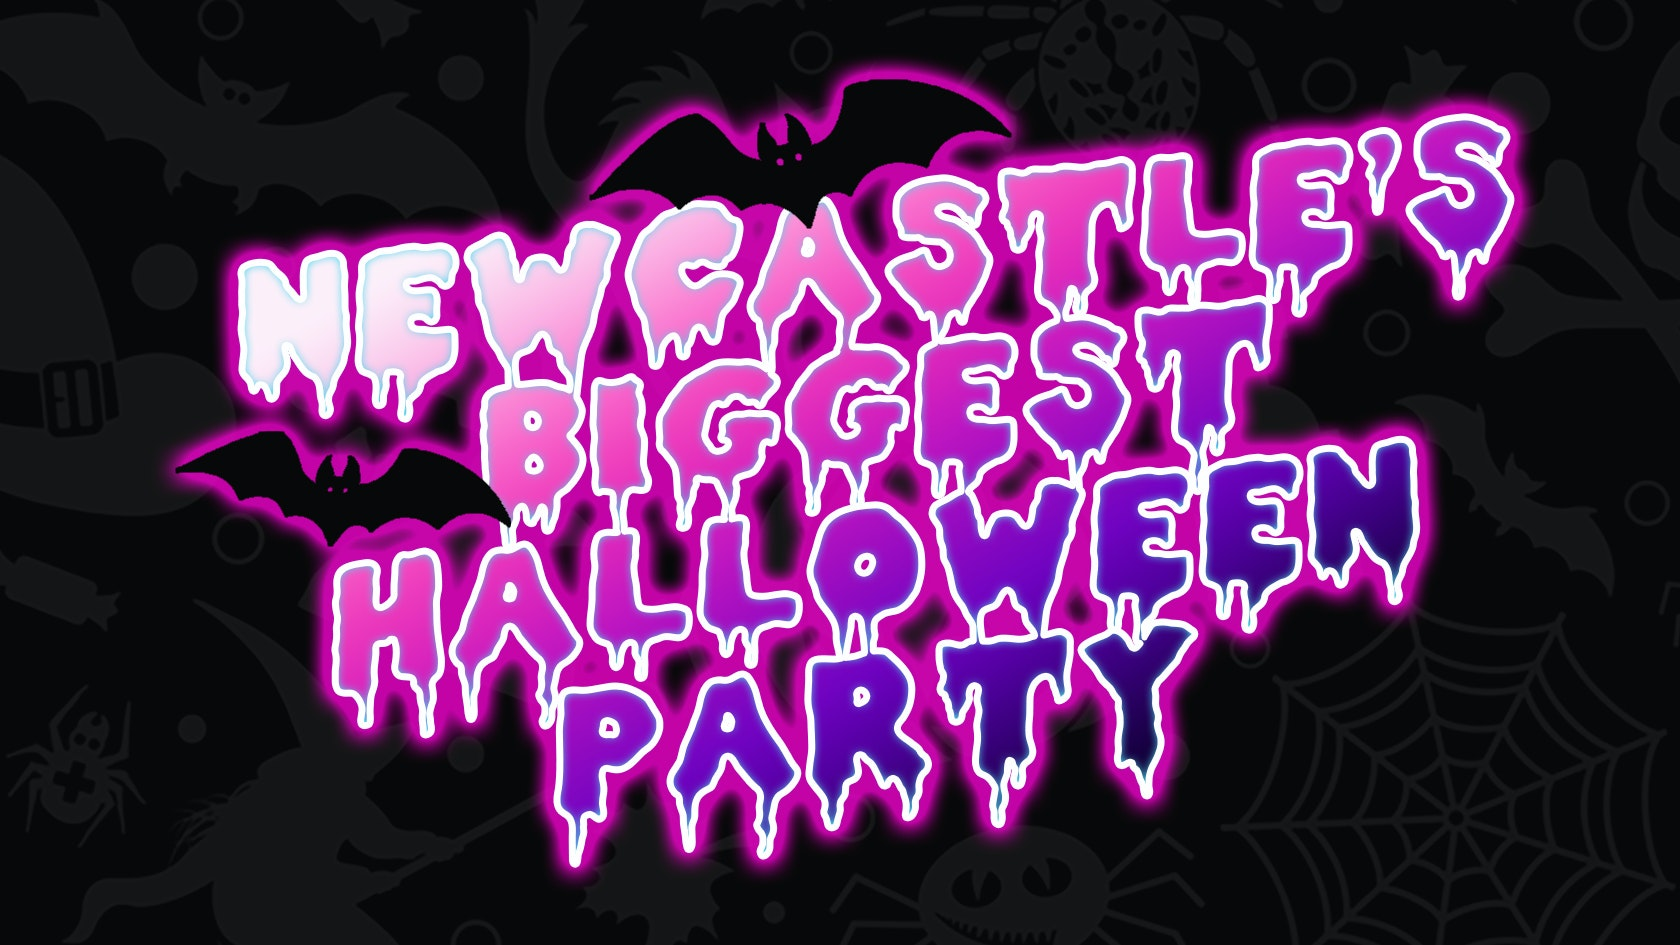 Halloween Ball Newcastle 2021